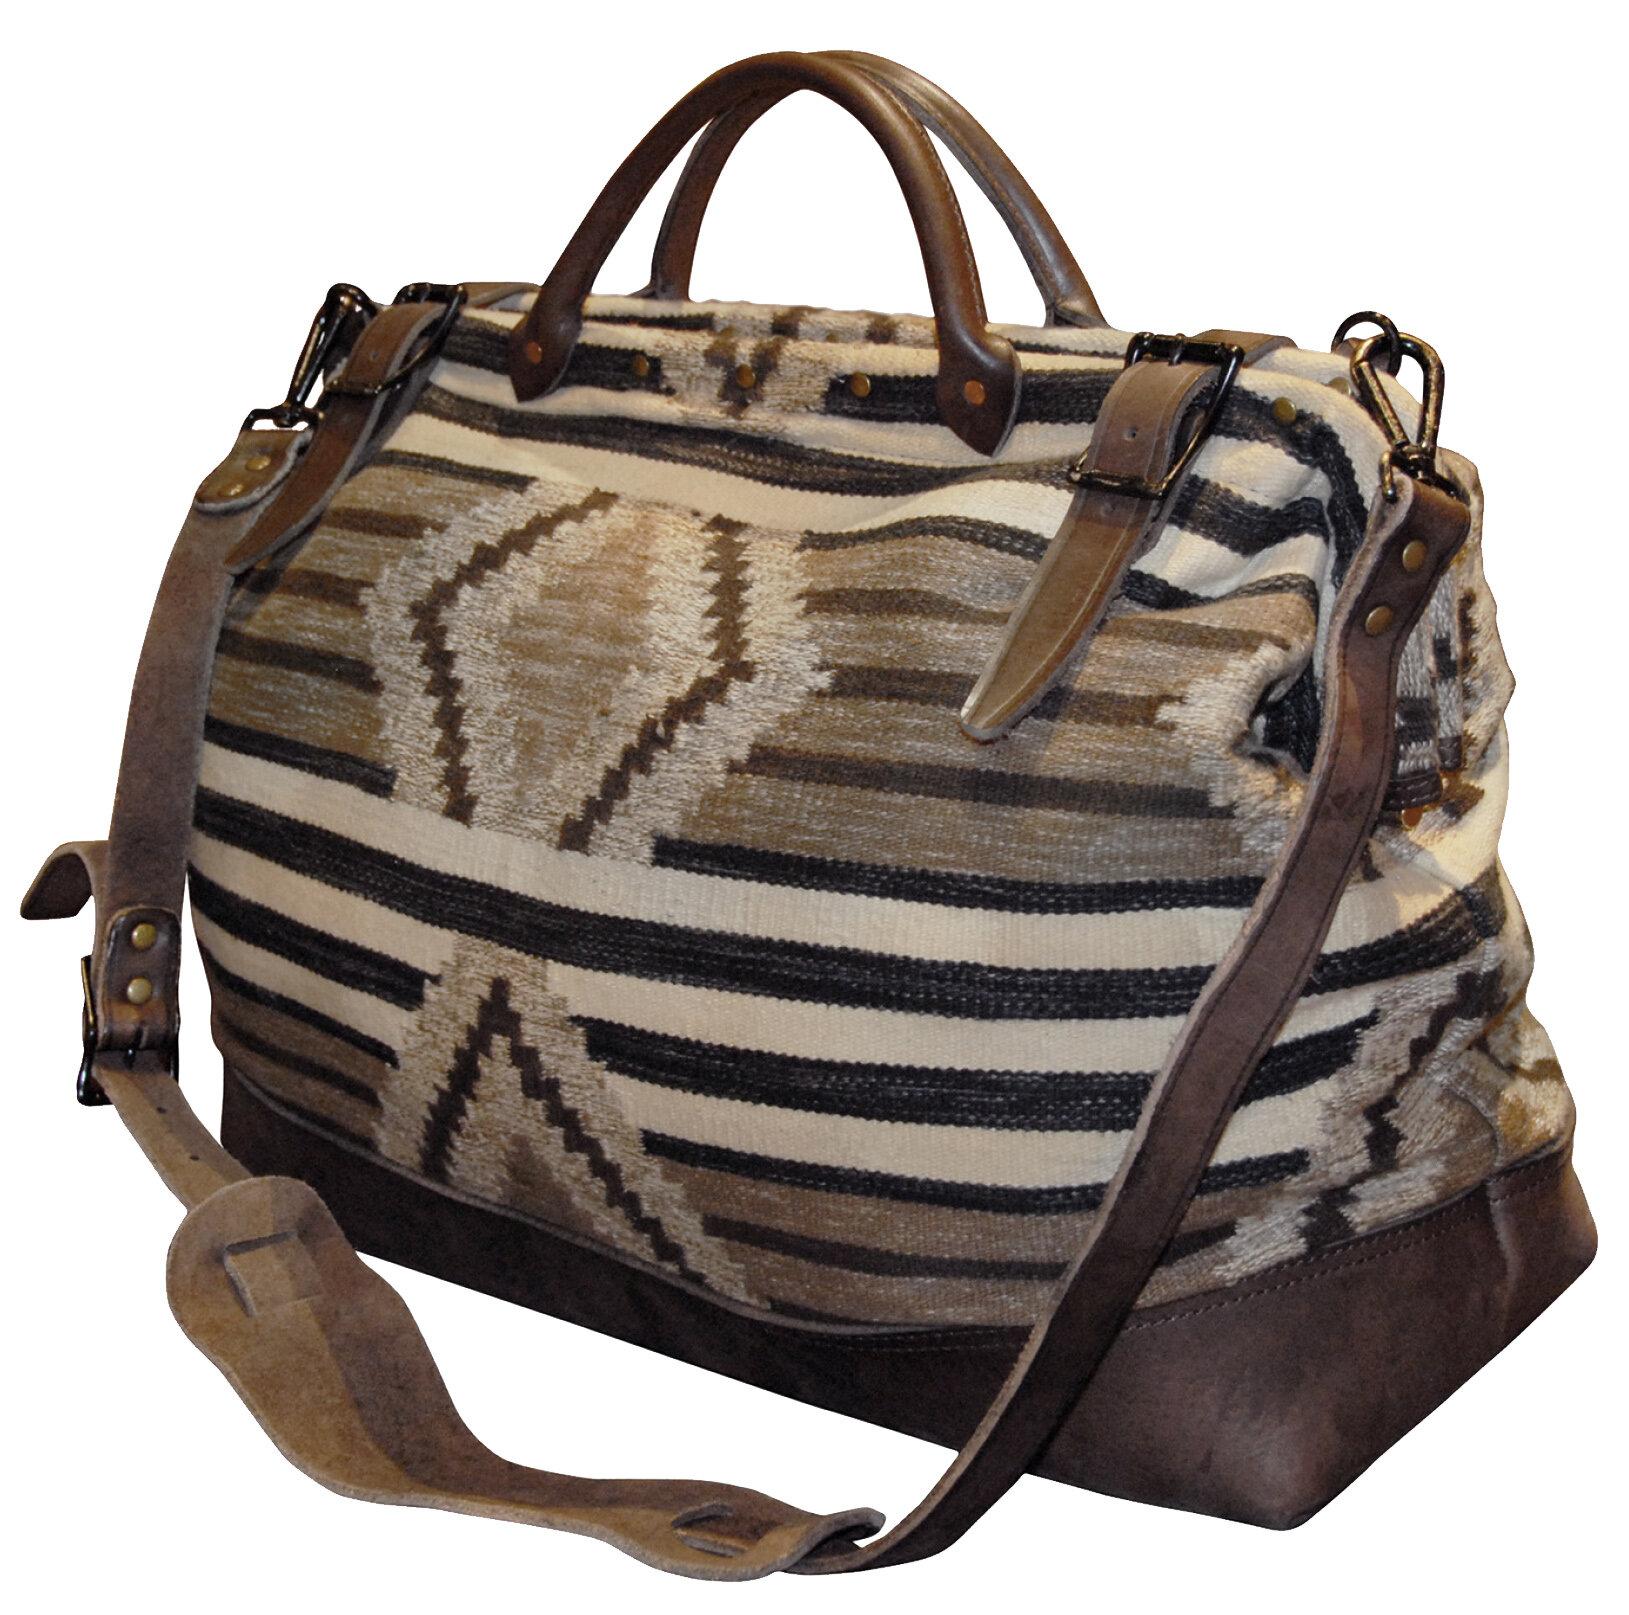 Martingale Bag